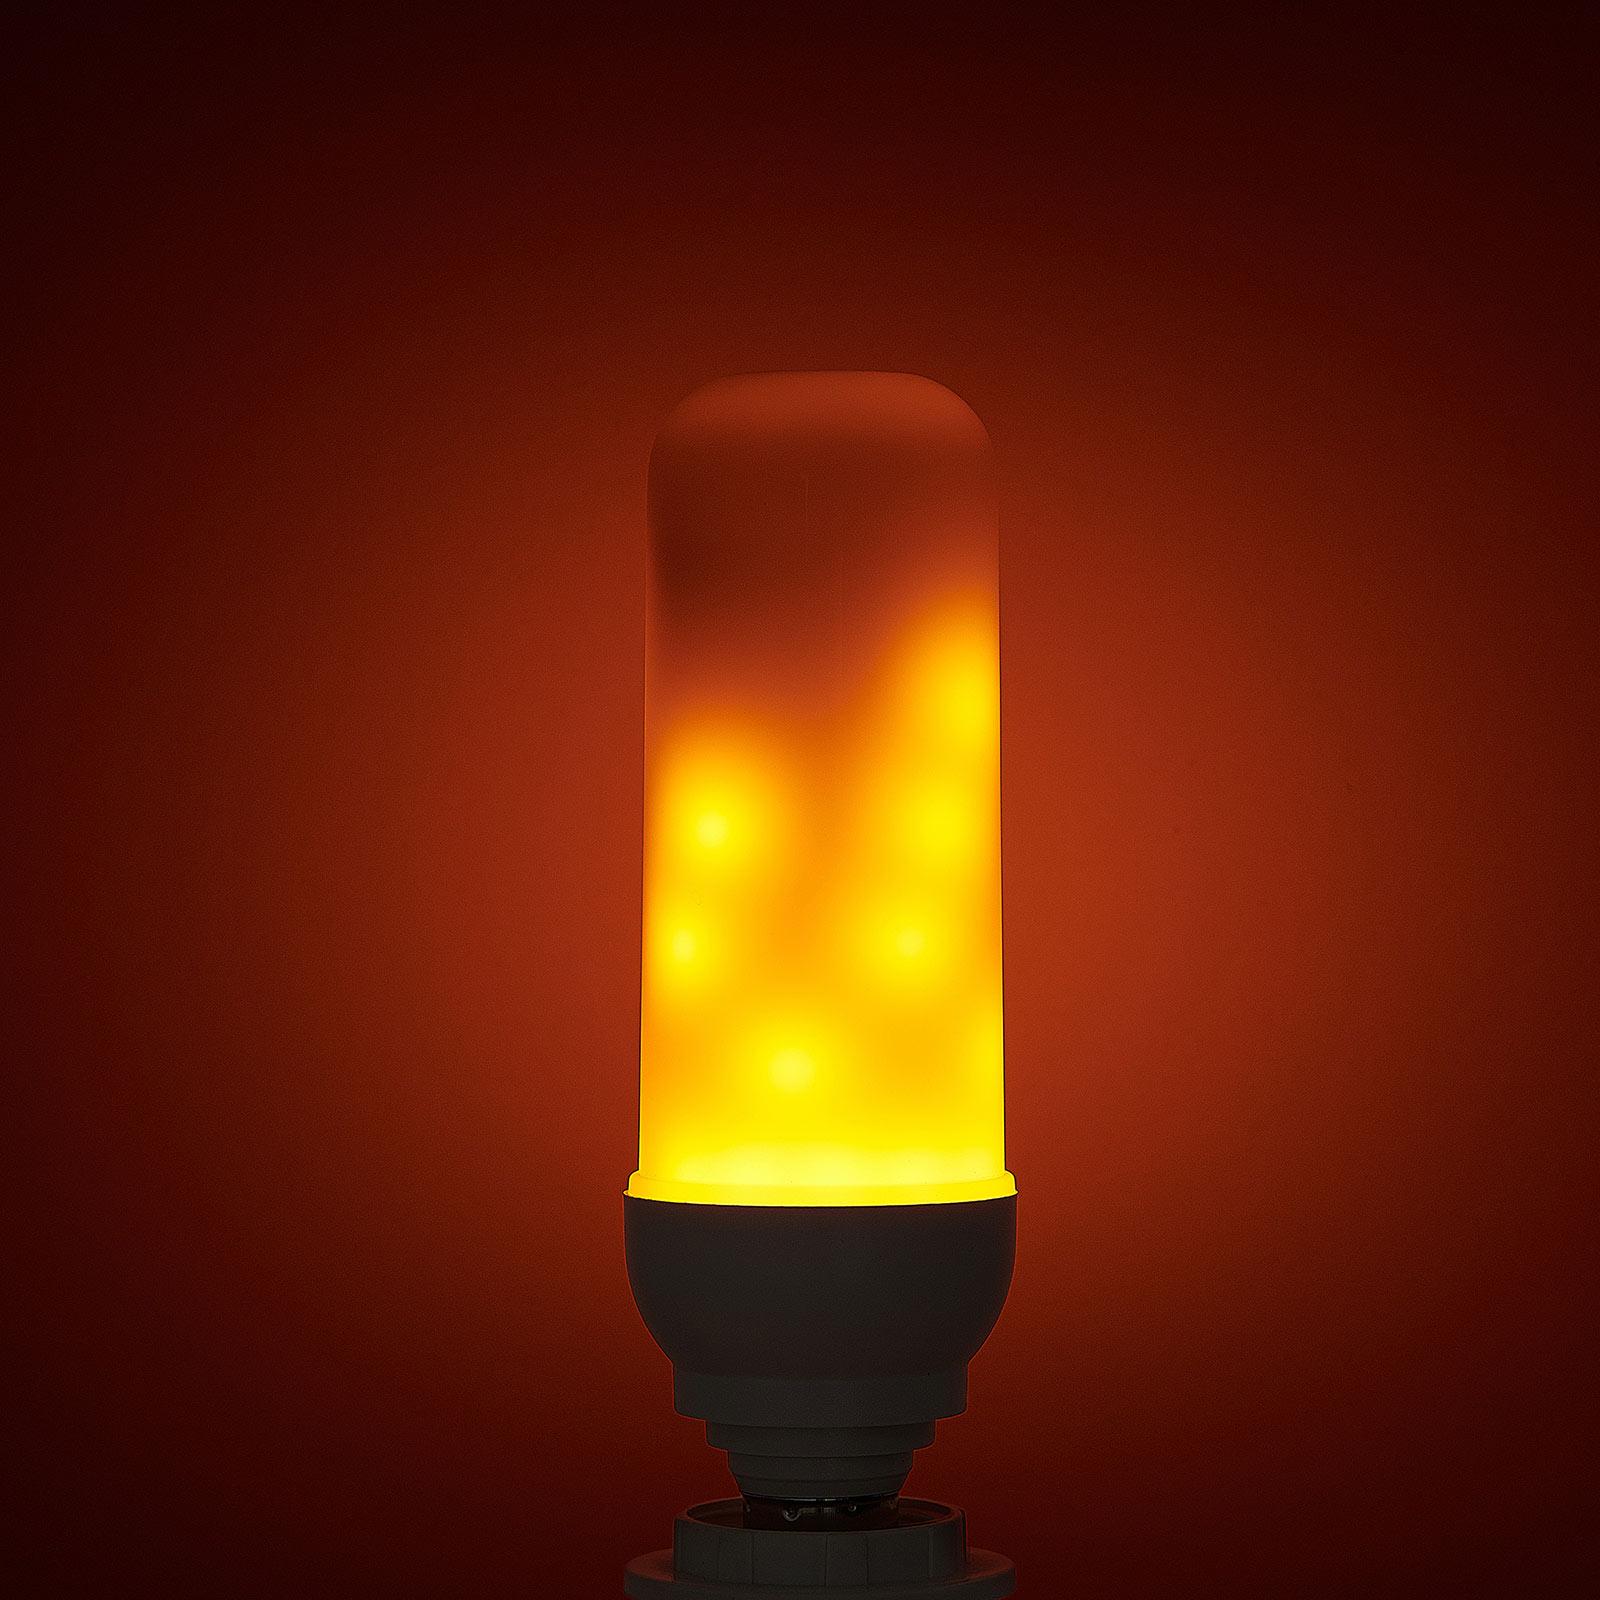 LED-lampa E14 3W Dancing Flame 1600K